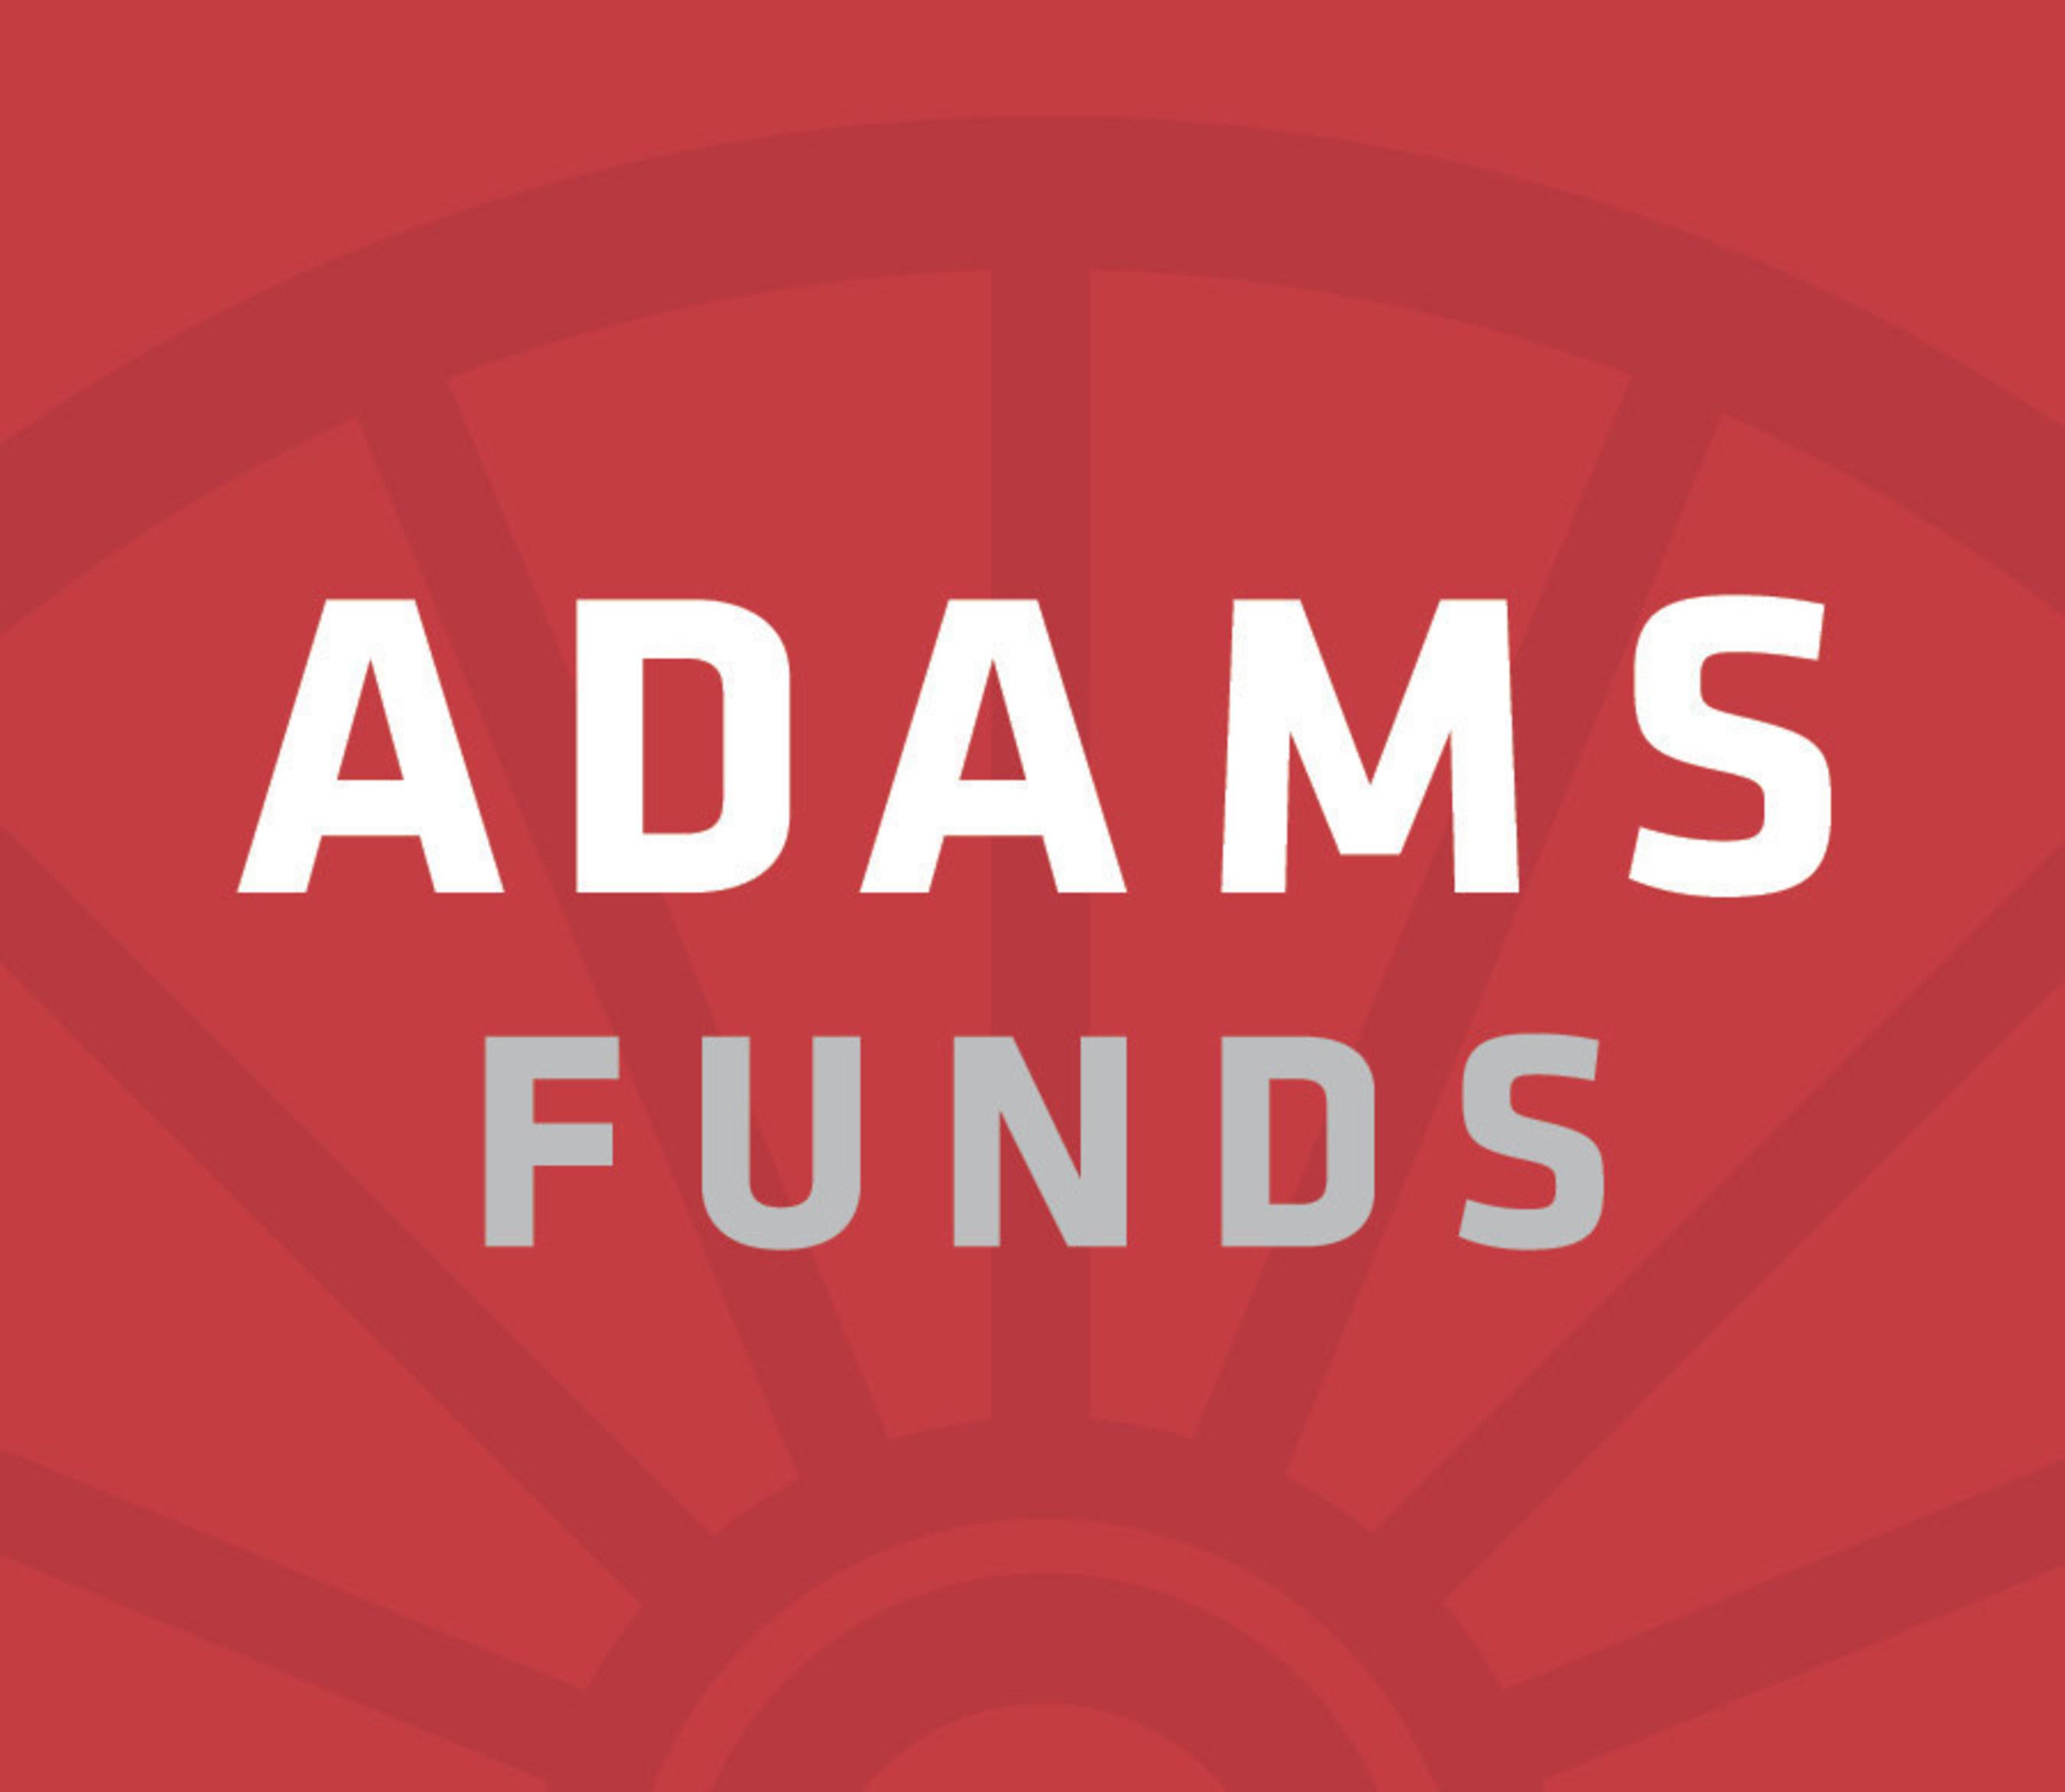 Adams Funds